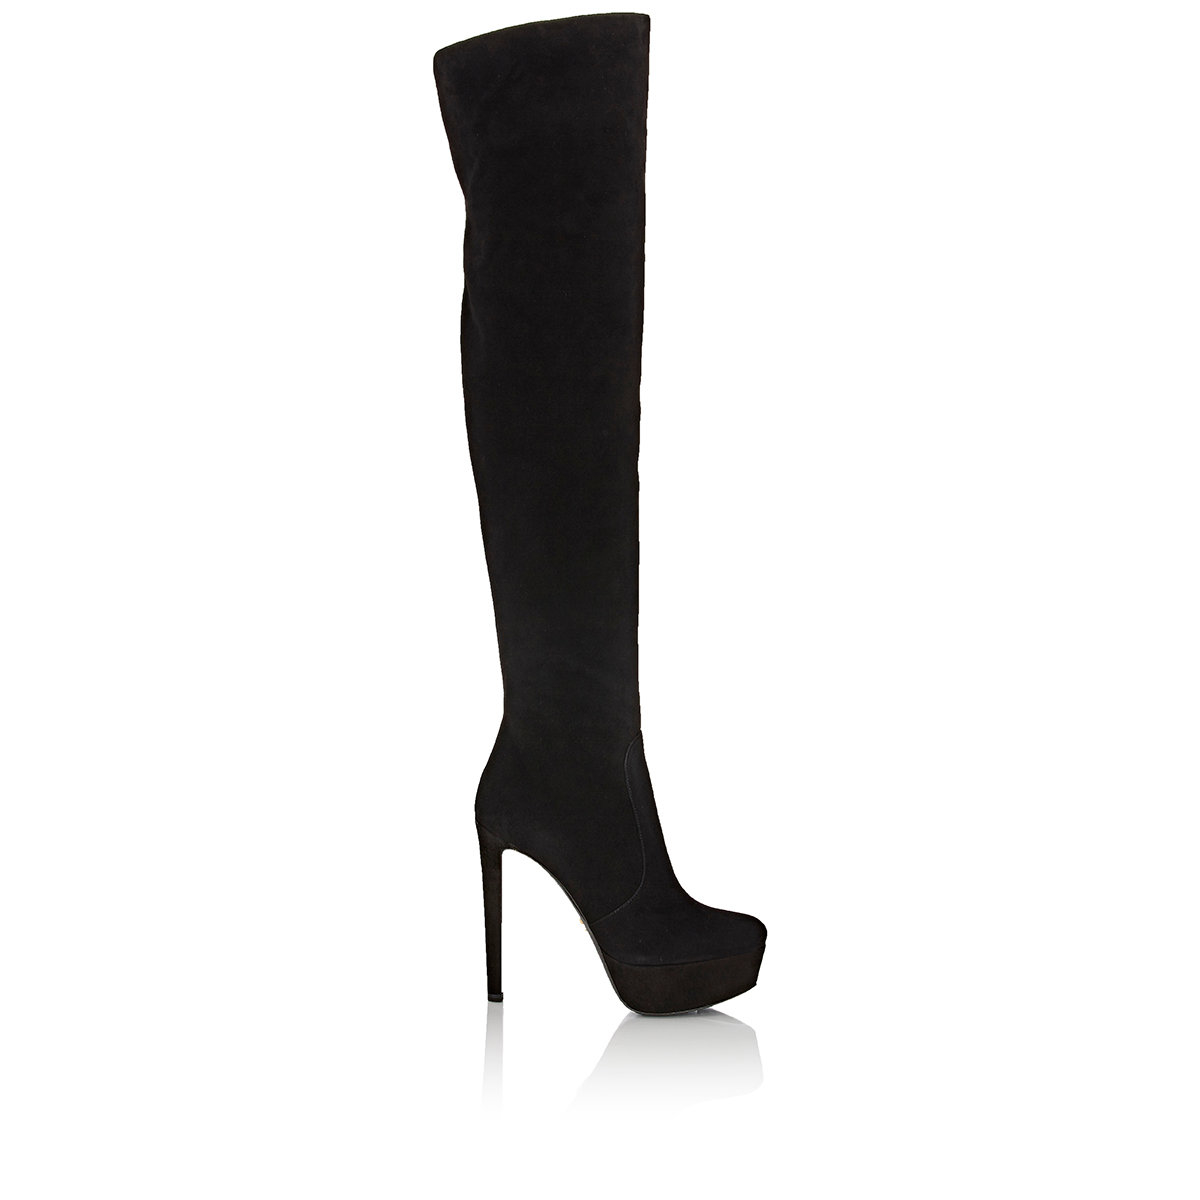 b073dd3c6ab Lyst - Prada Women s Suede Over-the-knee Platform Boots in Black